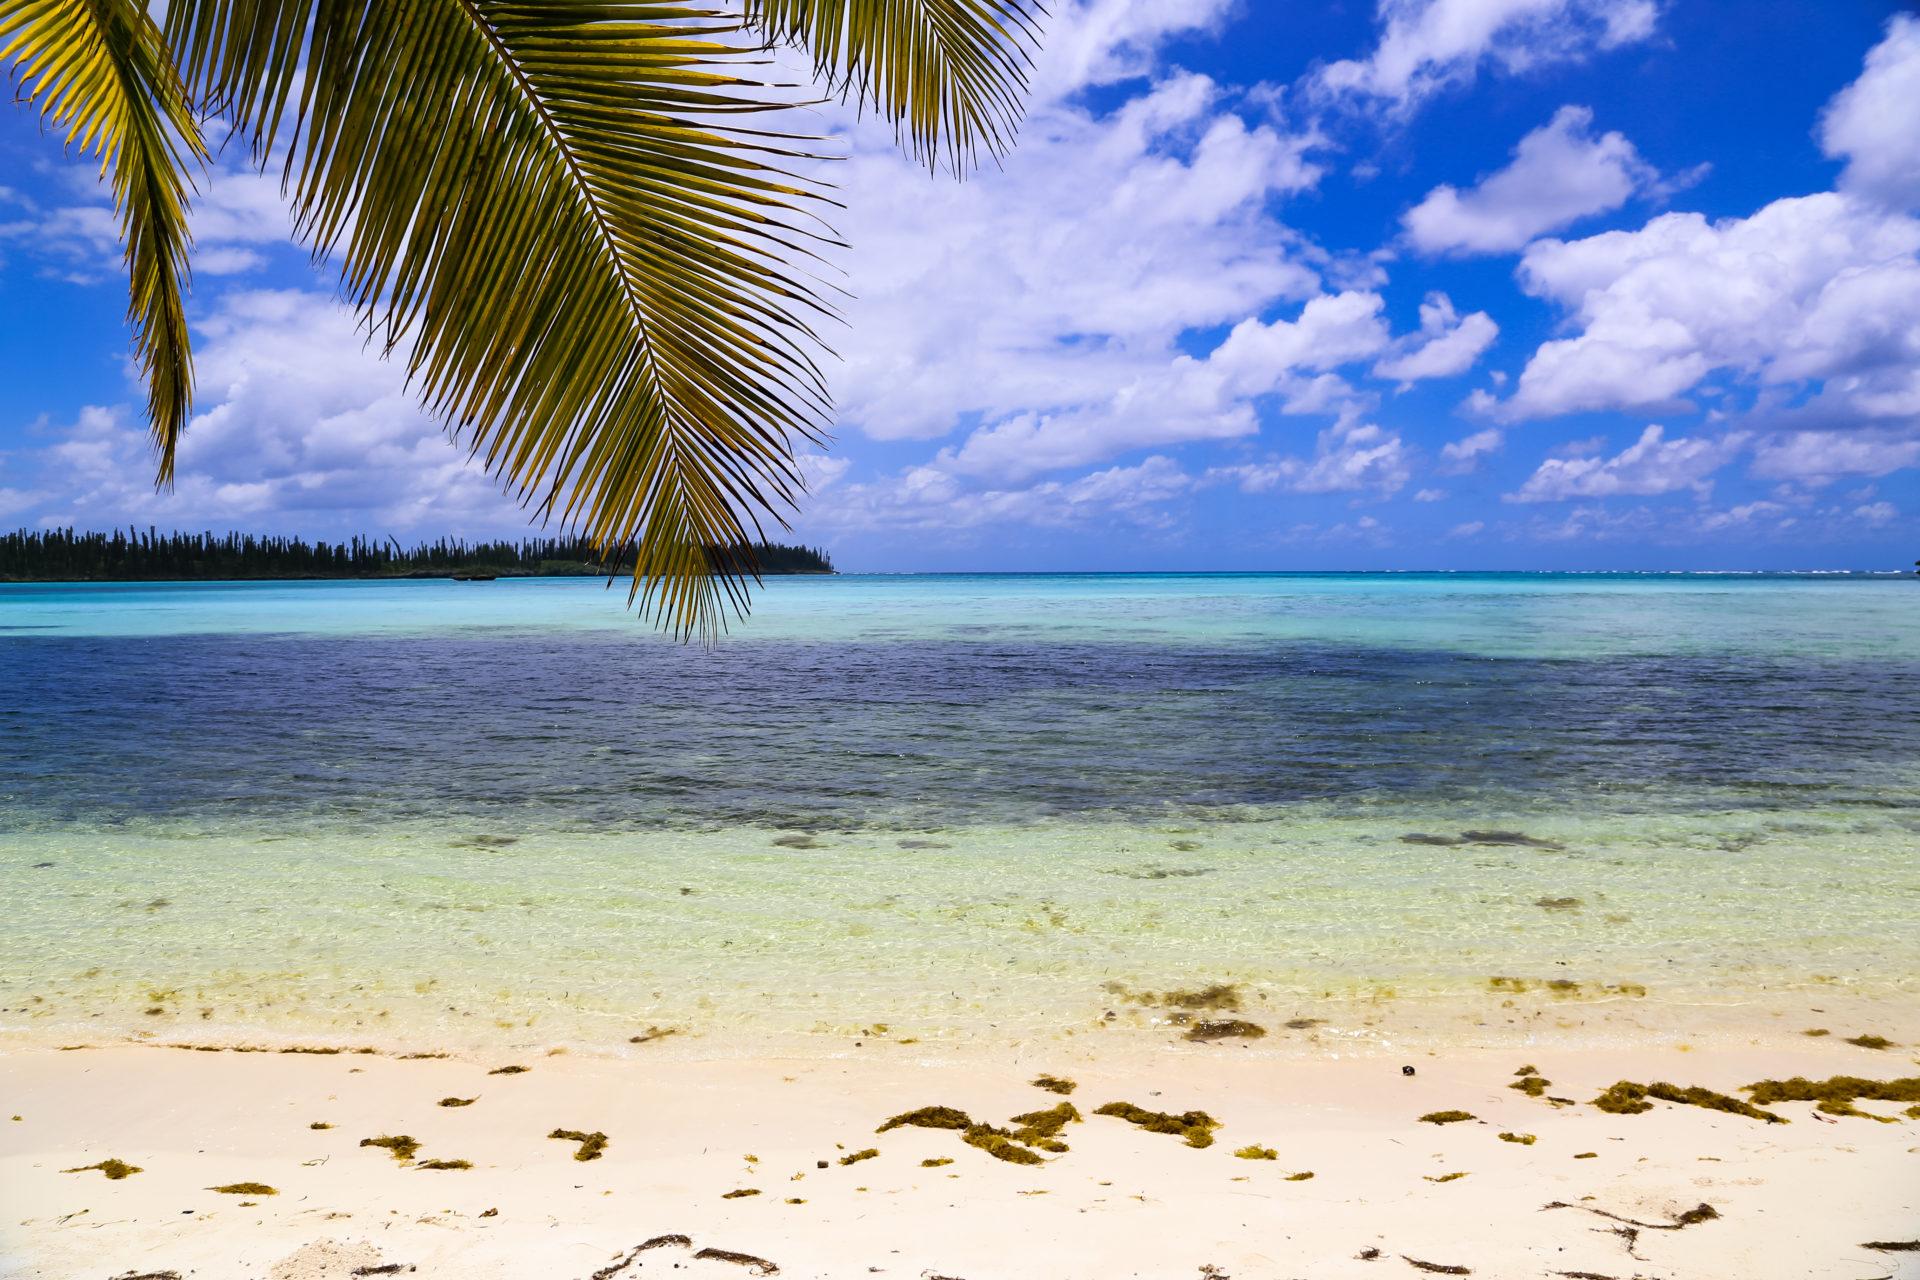 New Caledonia 2013 # 03